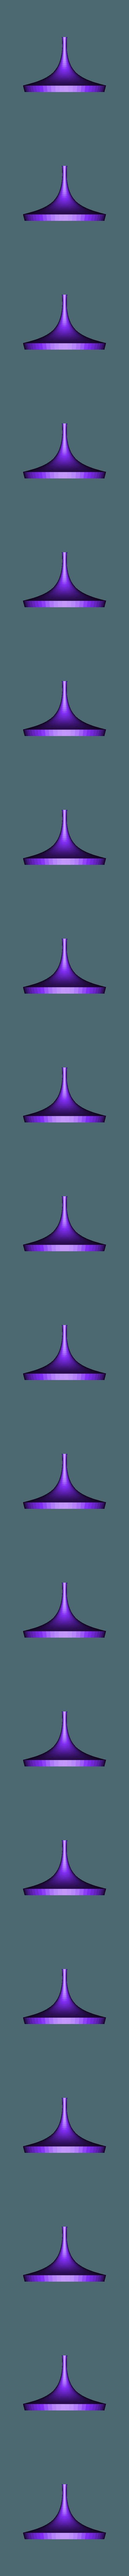 Part1.STL Download free STL file hanging lamps • 3D print design, allv